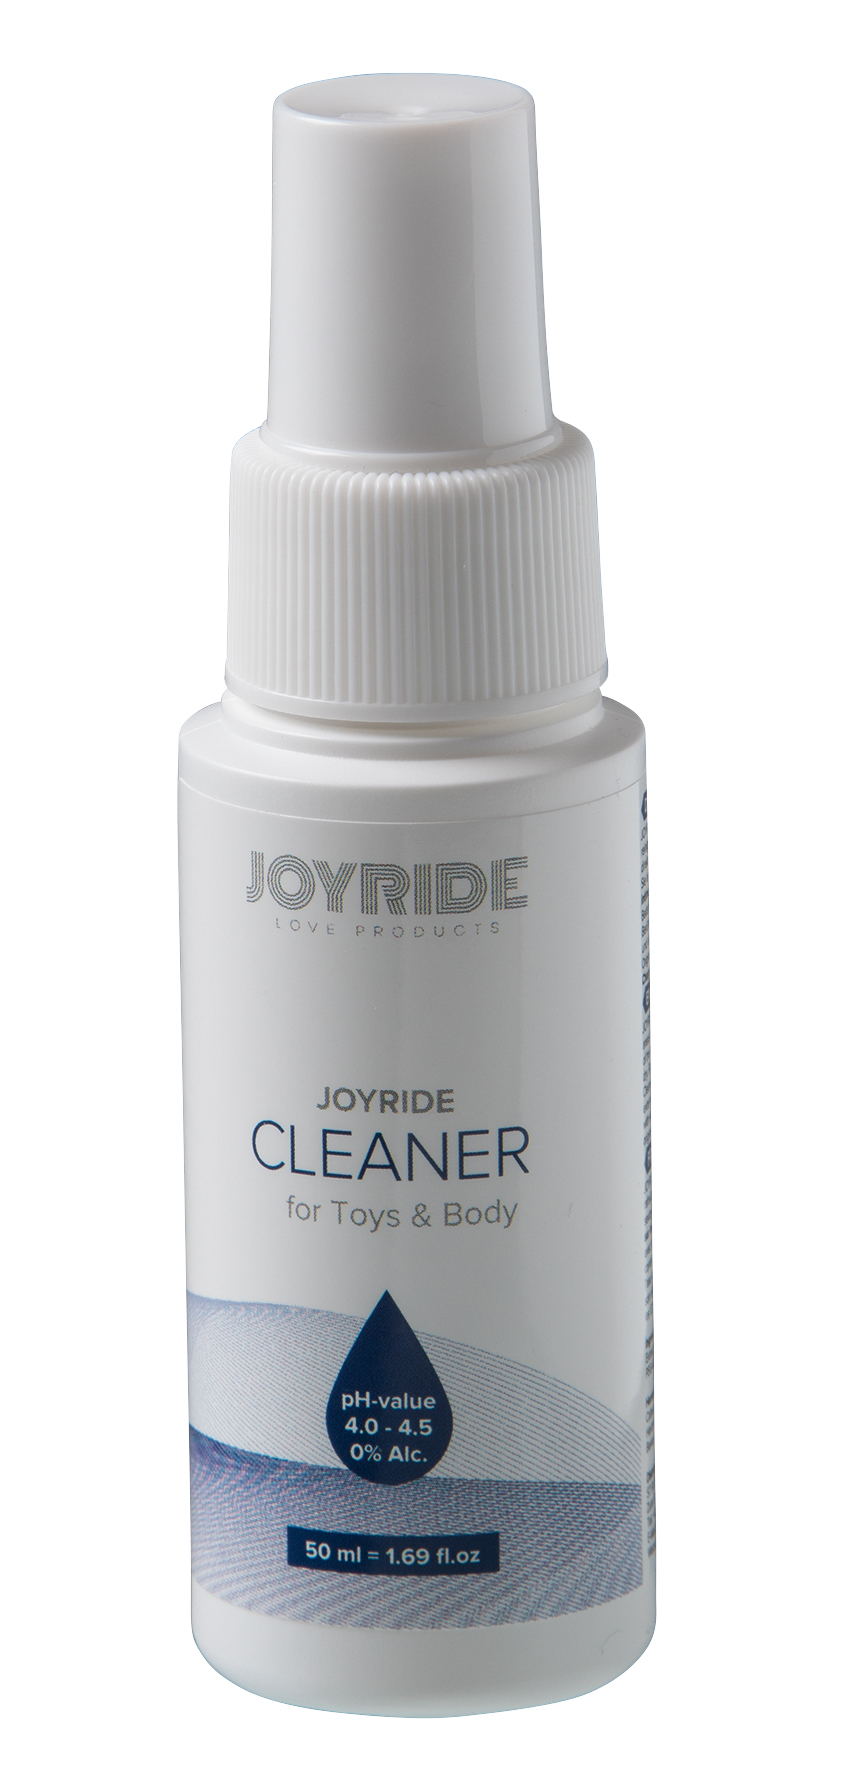 JOYRIDE Cleaner for Toys & Body